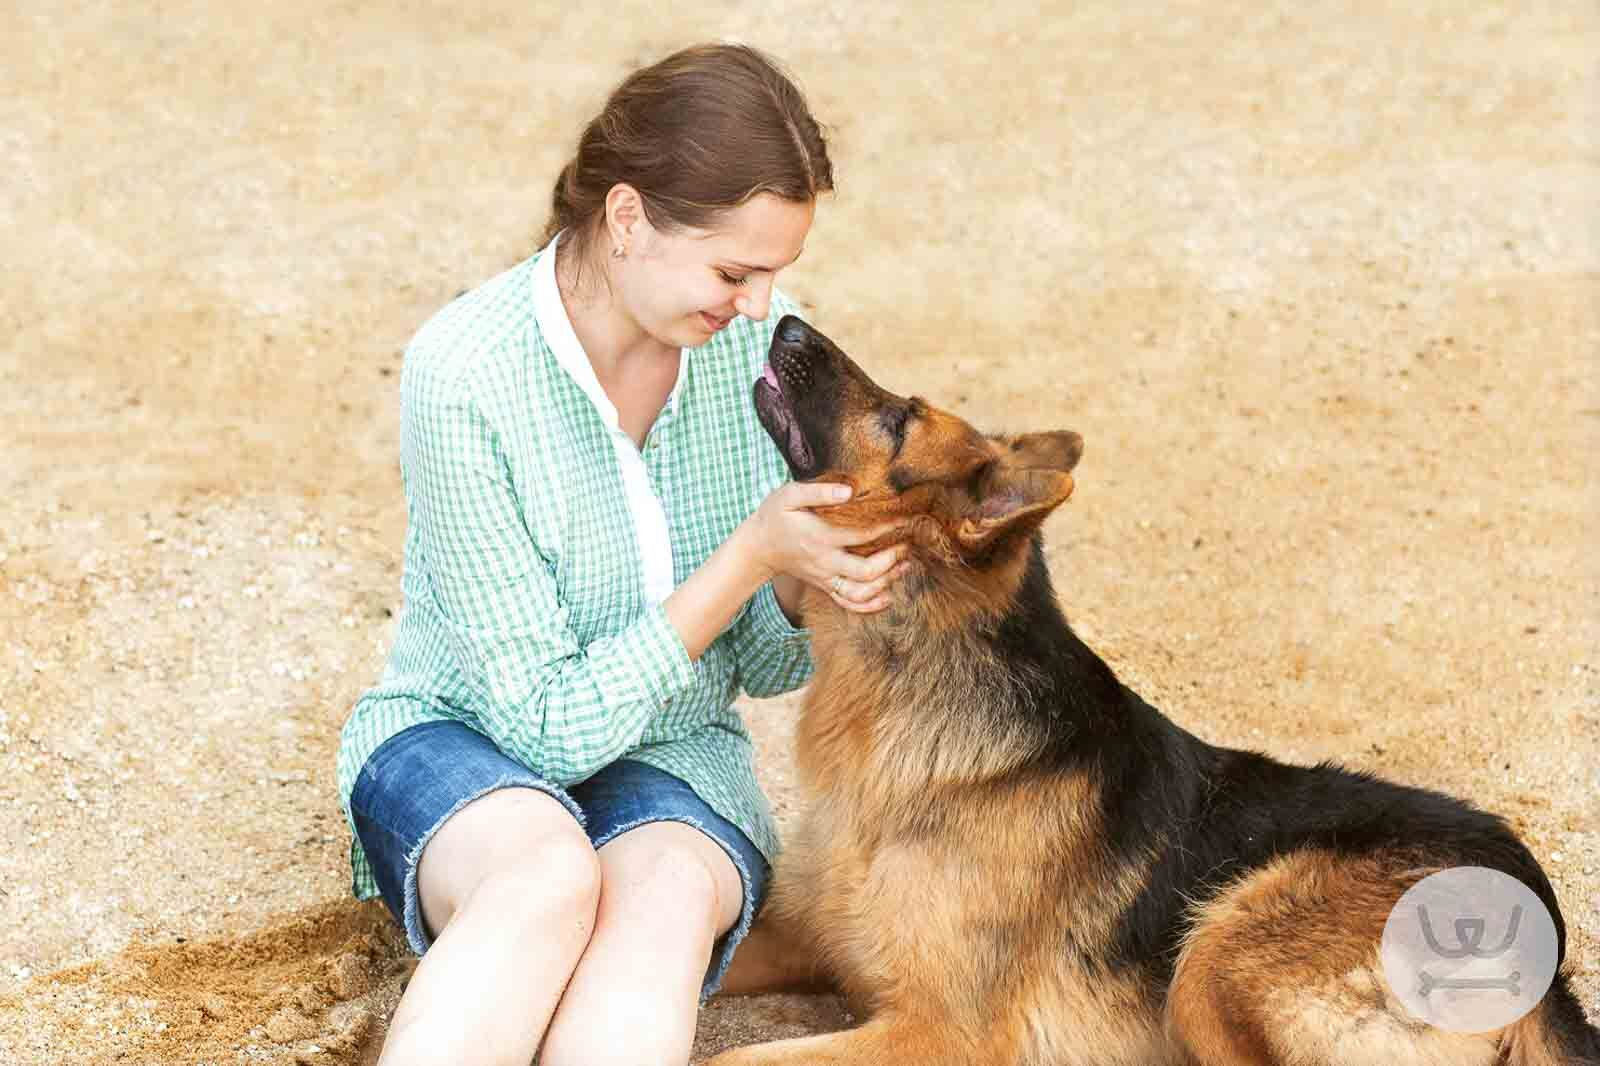 Woofland - Έρευνα κατανοώντας την σχέση με τον σκύλο μας